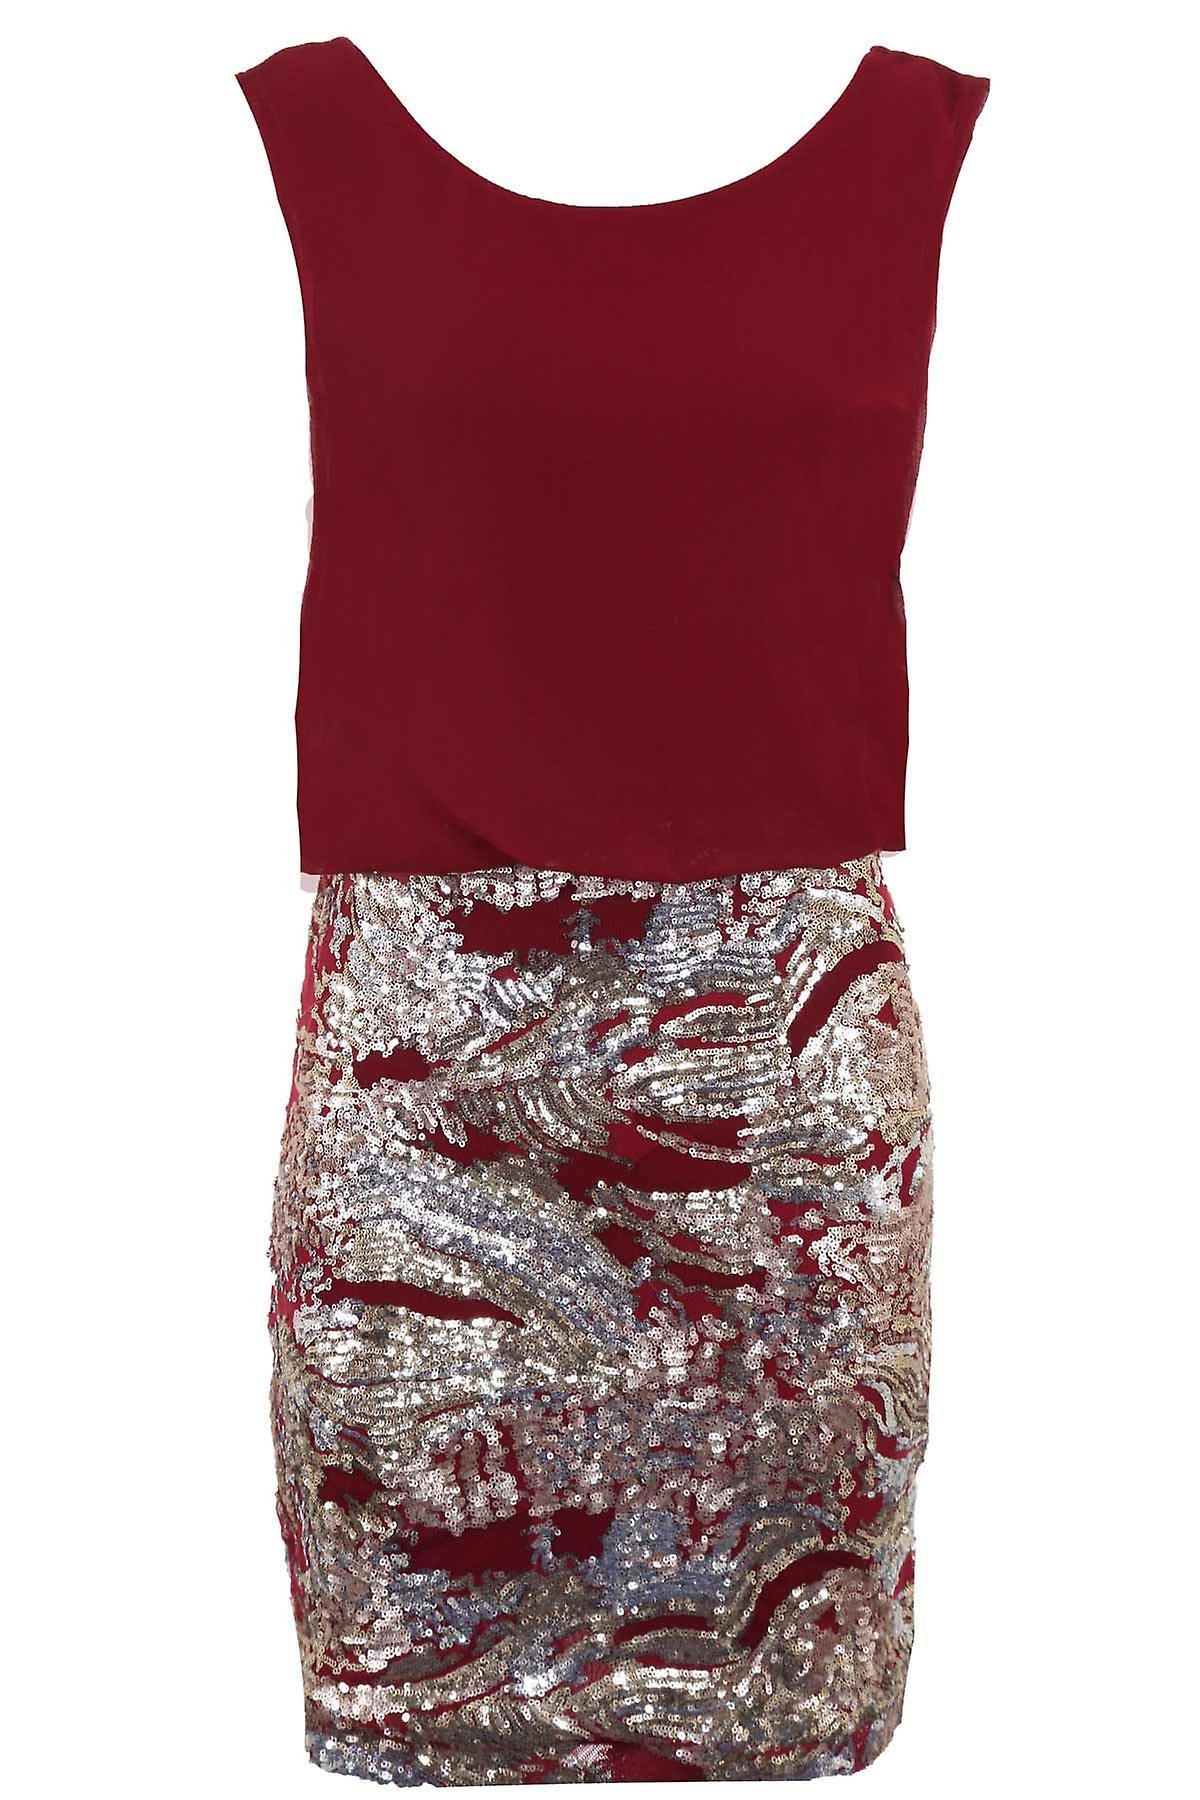 Ladies V Back Chiffon Sequin Skirt Slim Fitting Bodycon Women's Party Evening Dress